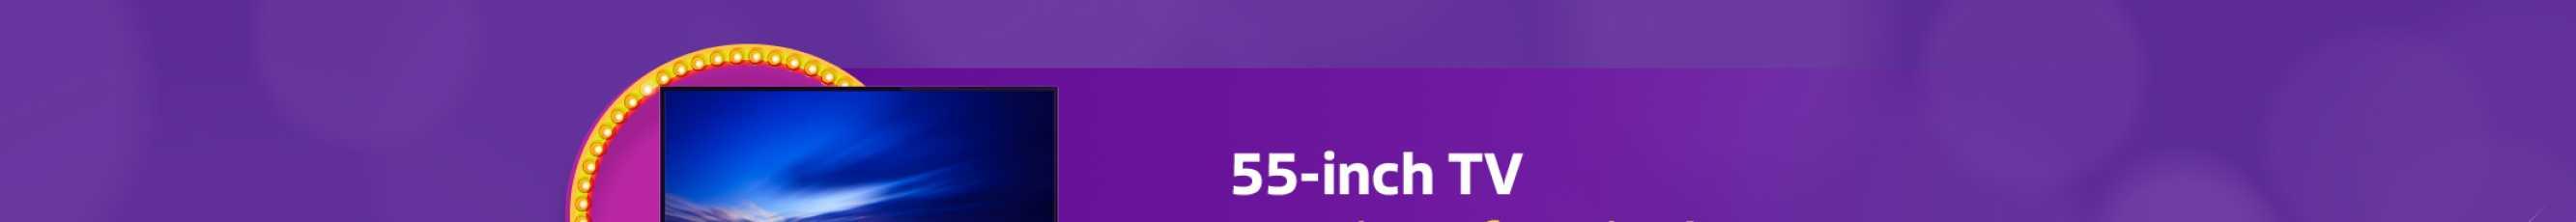 tv-bbdint-55inchtvsSlice1